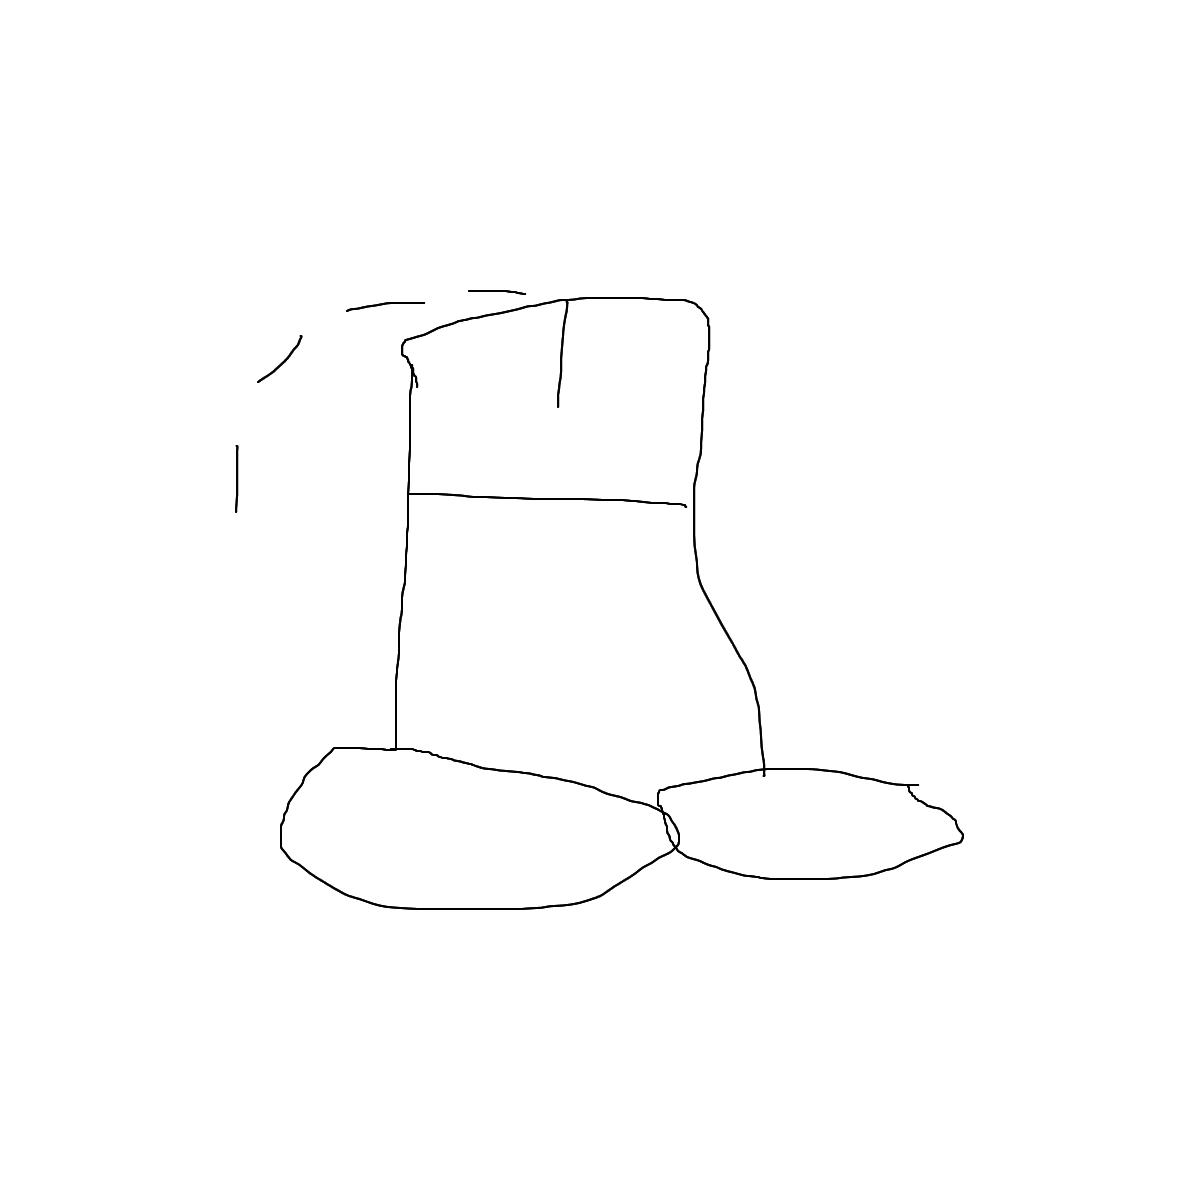 BAAAM drawing#1690 lat:53.4975090026855500lng: -1.3388212919235230